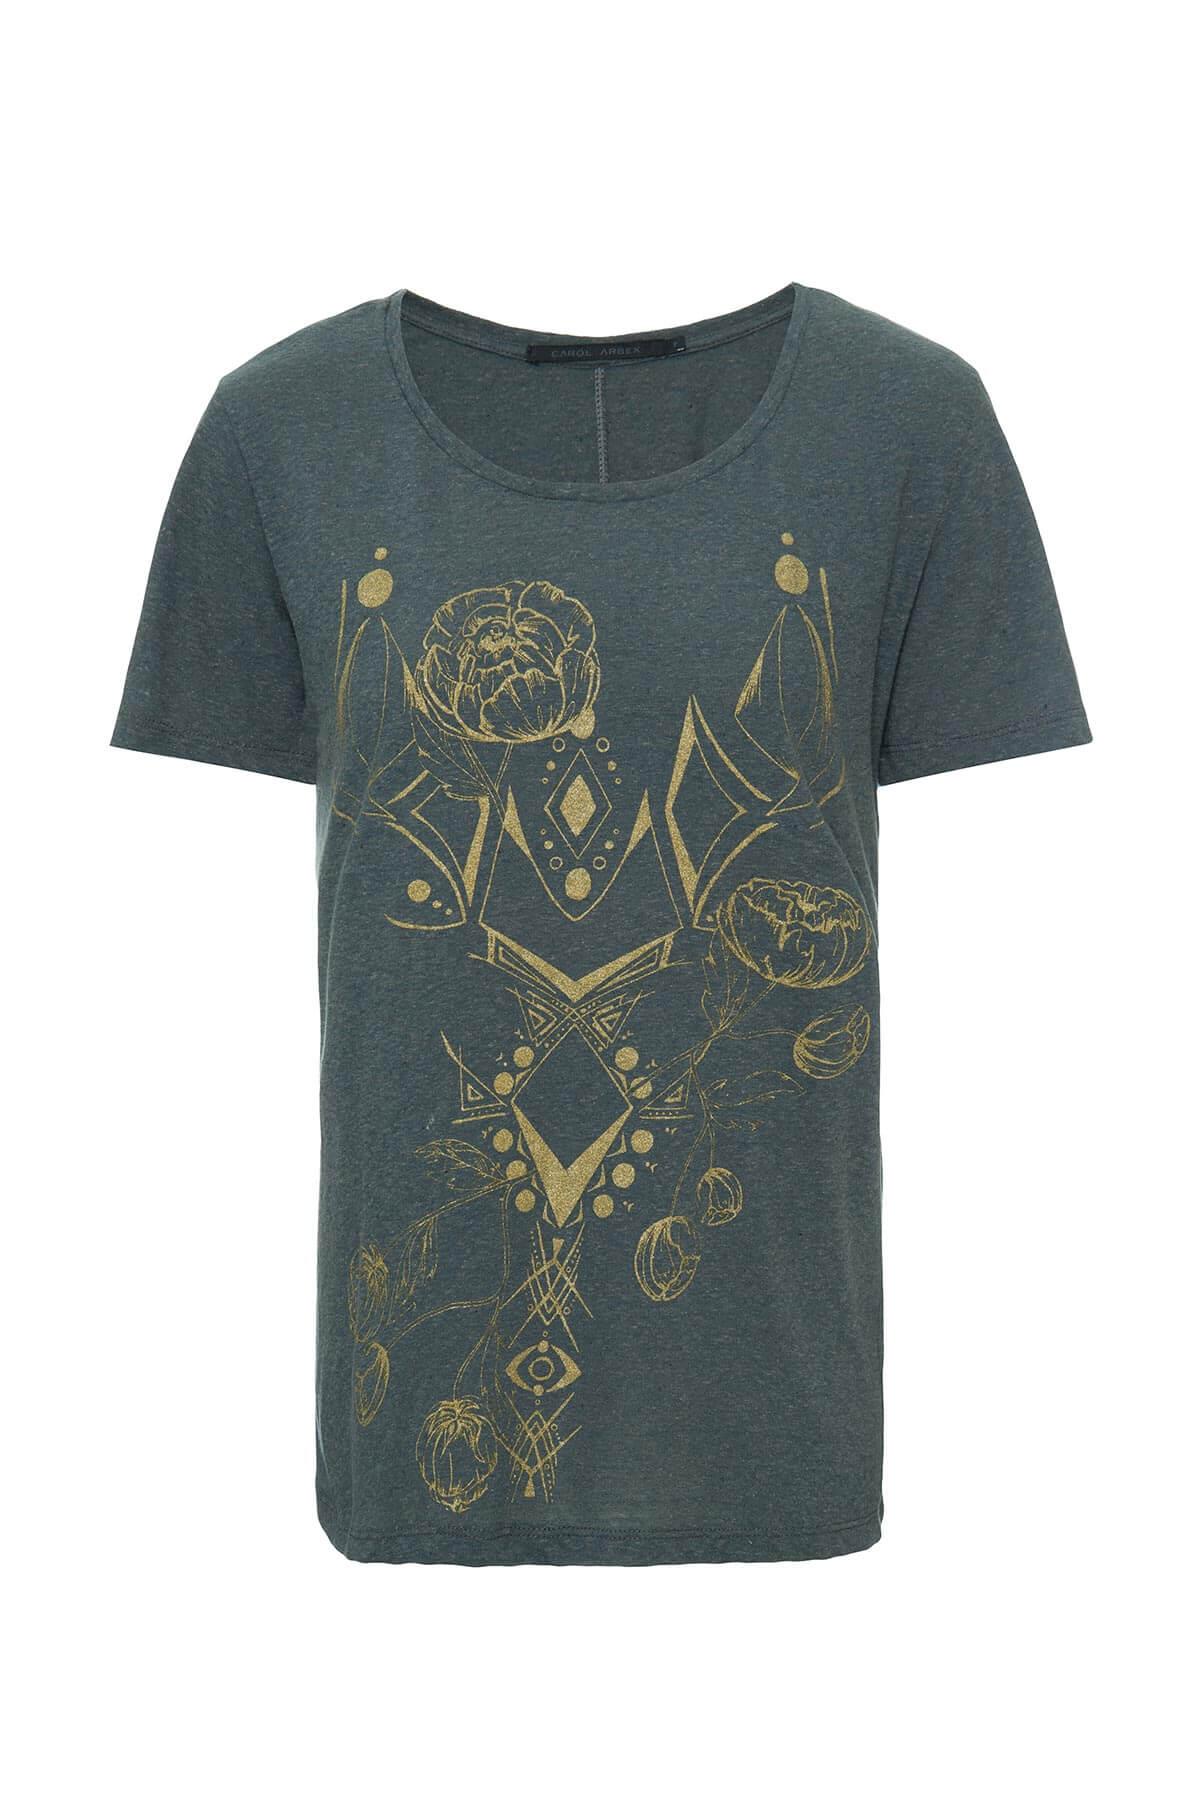 Tt Shirt Escorpião